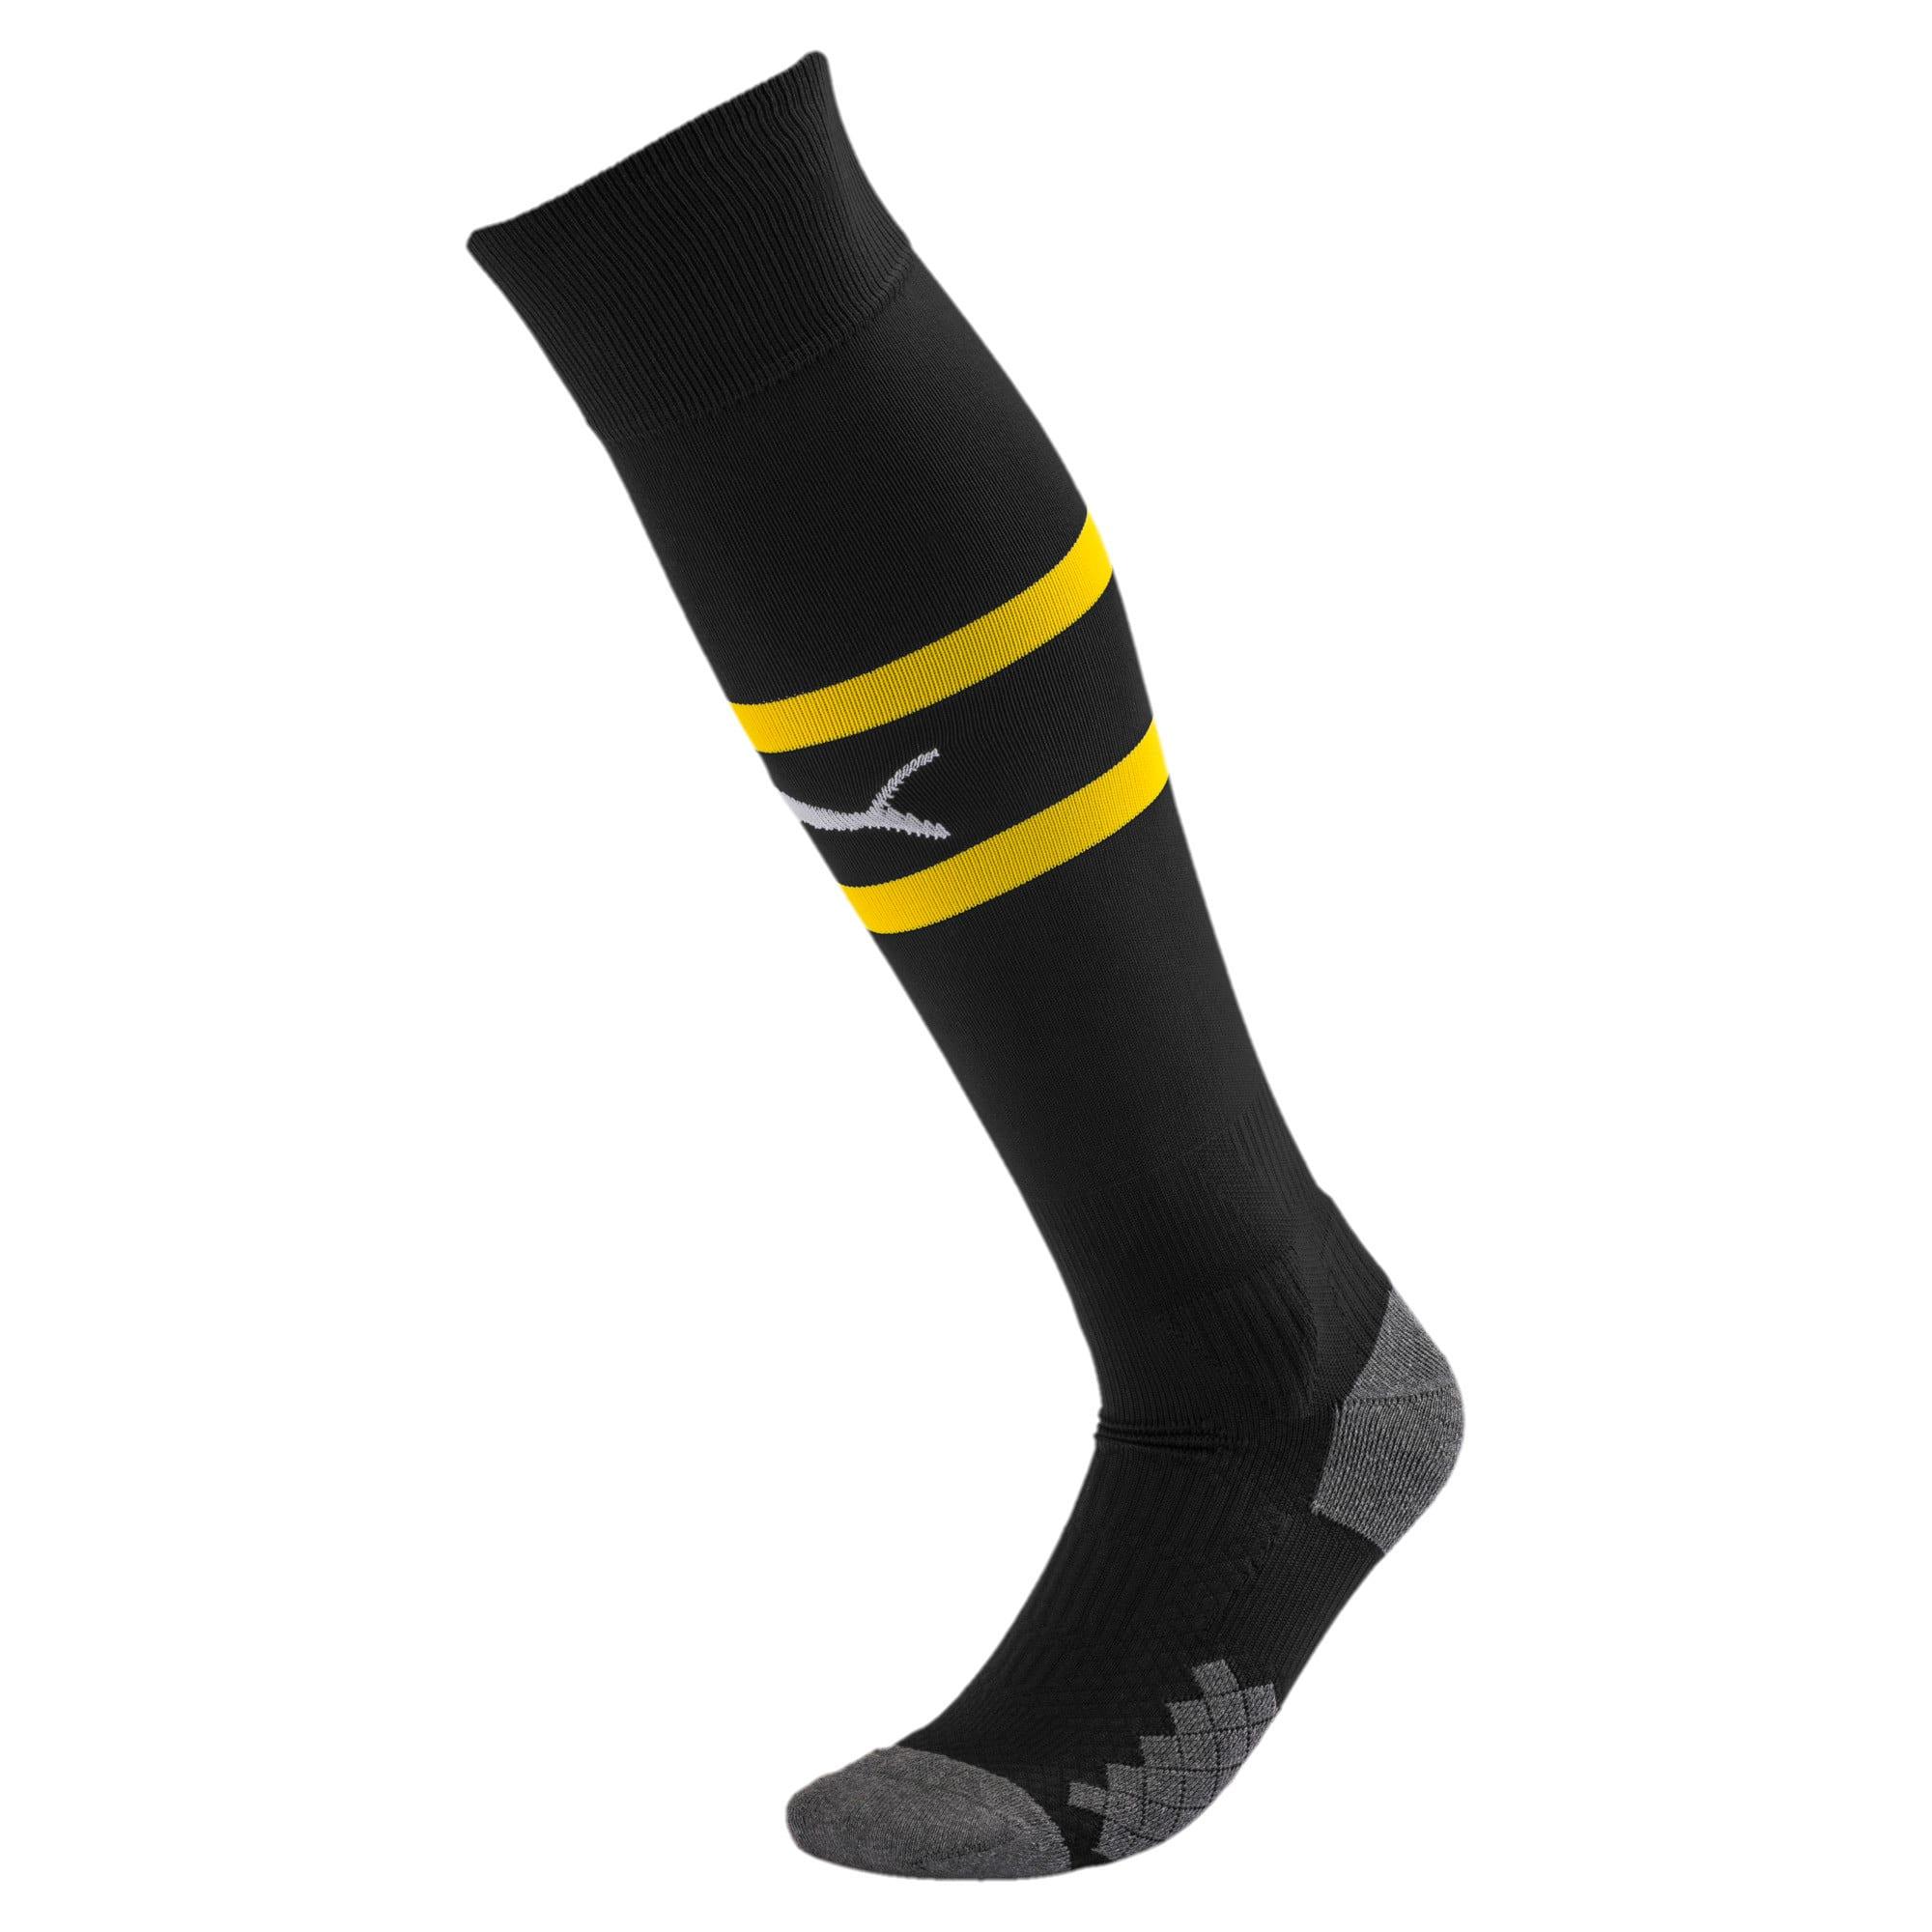 Thumbnail 1 of AC Milan Men's Band Socks, Puma Black-Cyber Yellow, medium